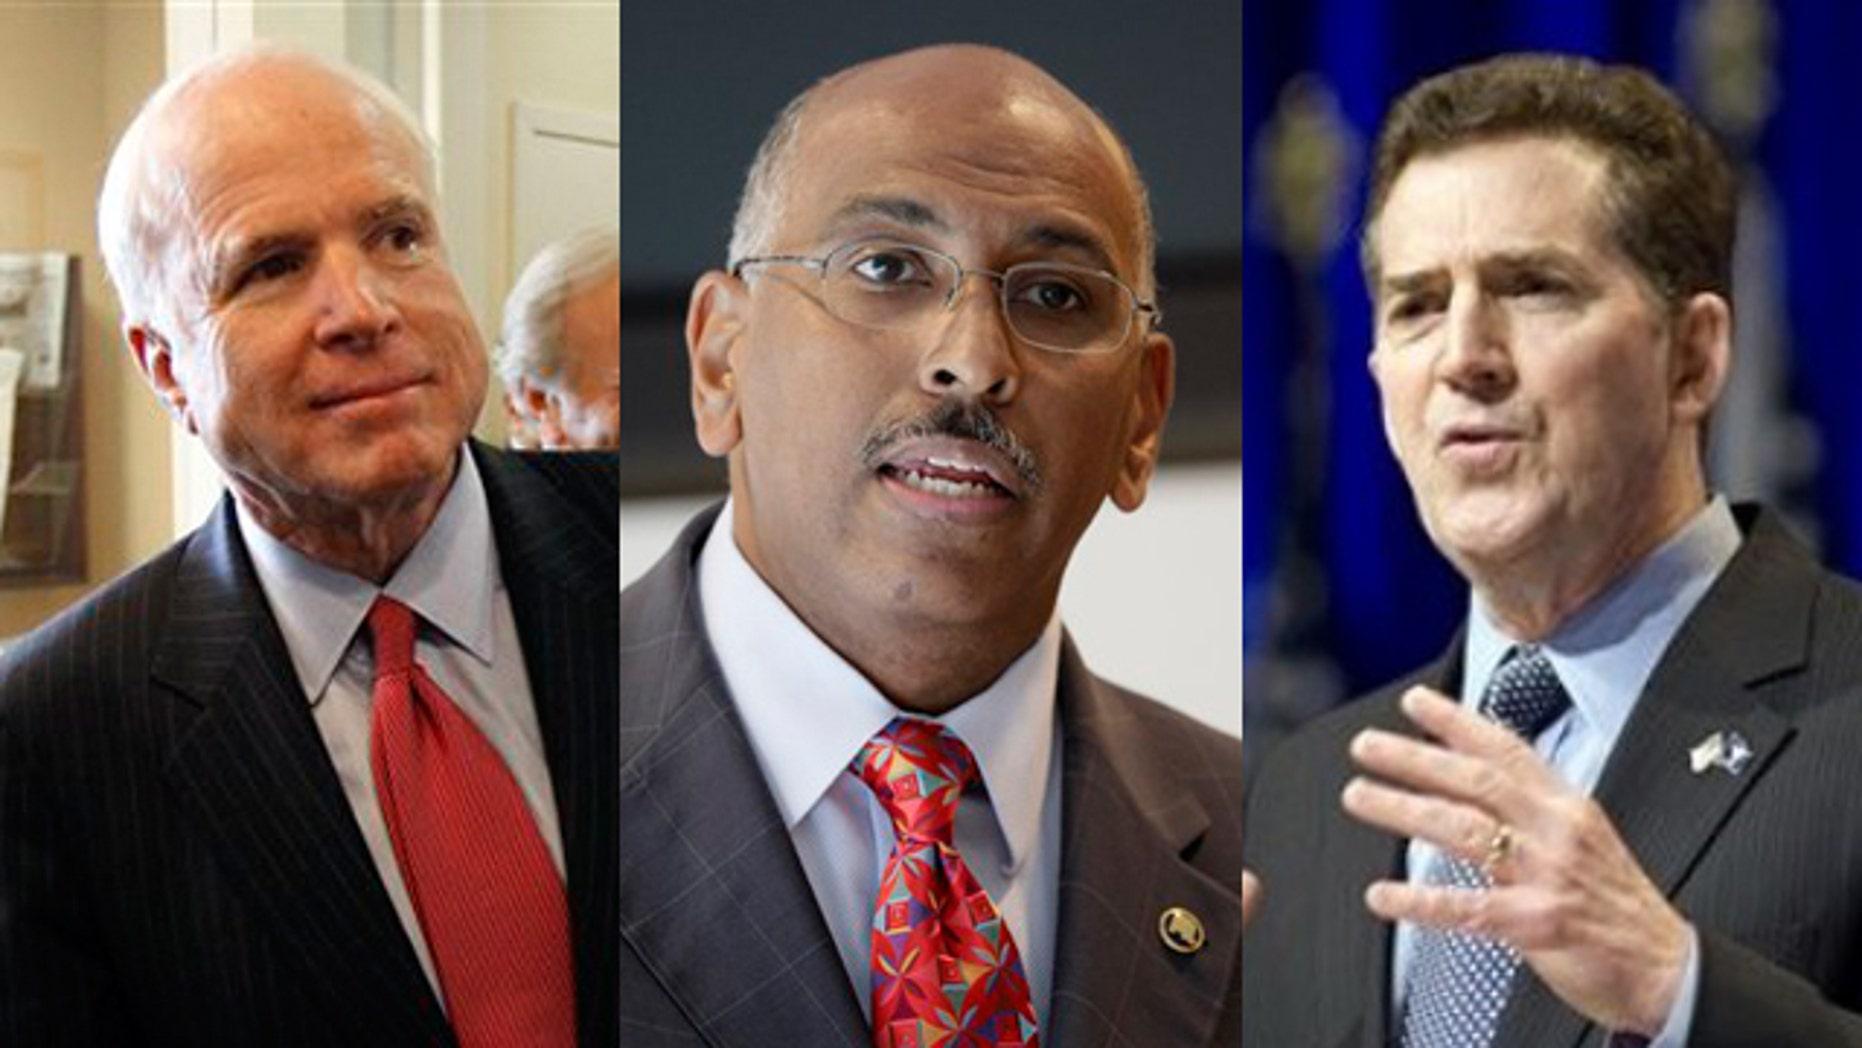 Shown here are Sen. John McCain, left, RNC Chairman Michael Steele, center, and Sen. Jim DeMint, right. (AP Photos)